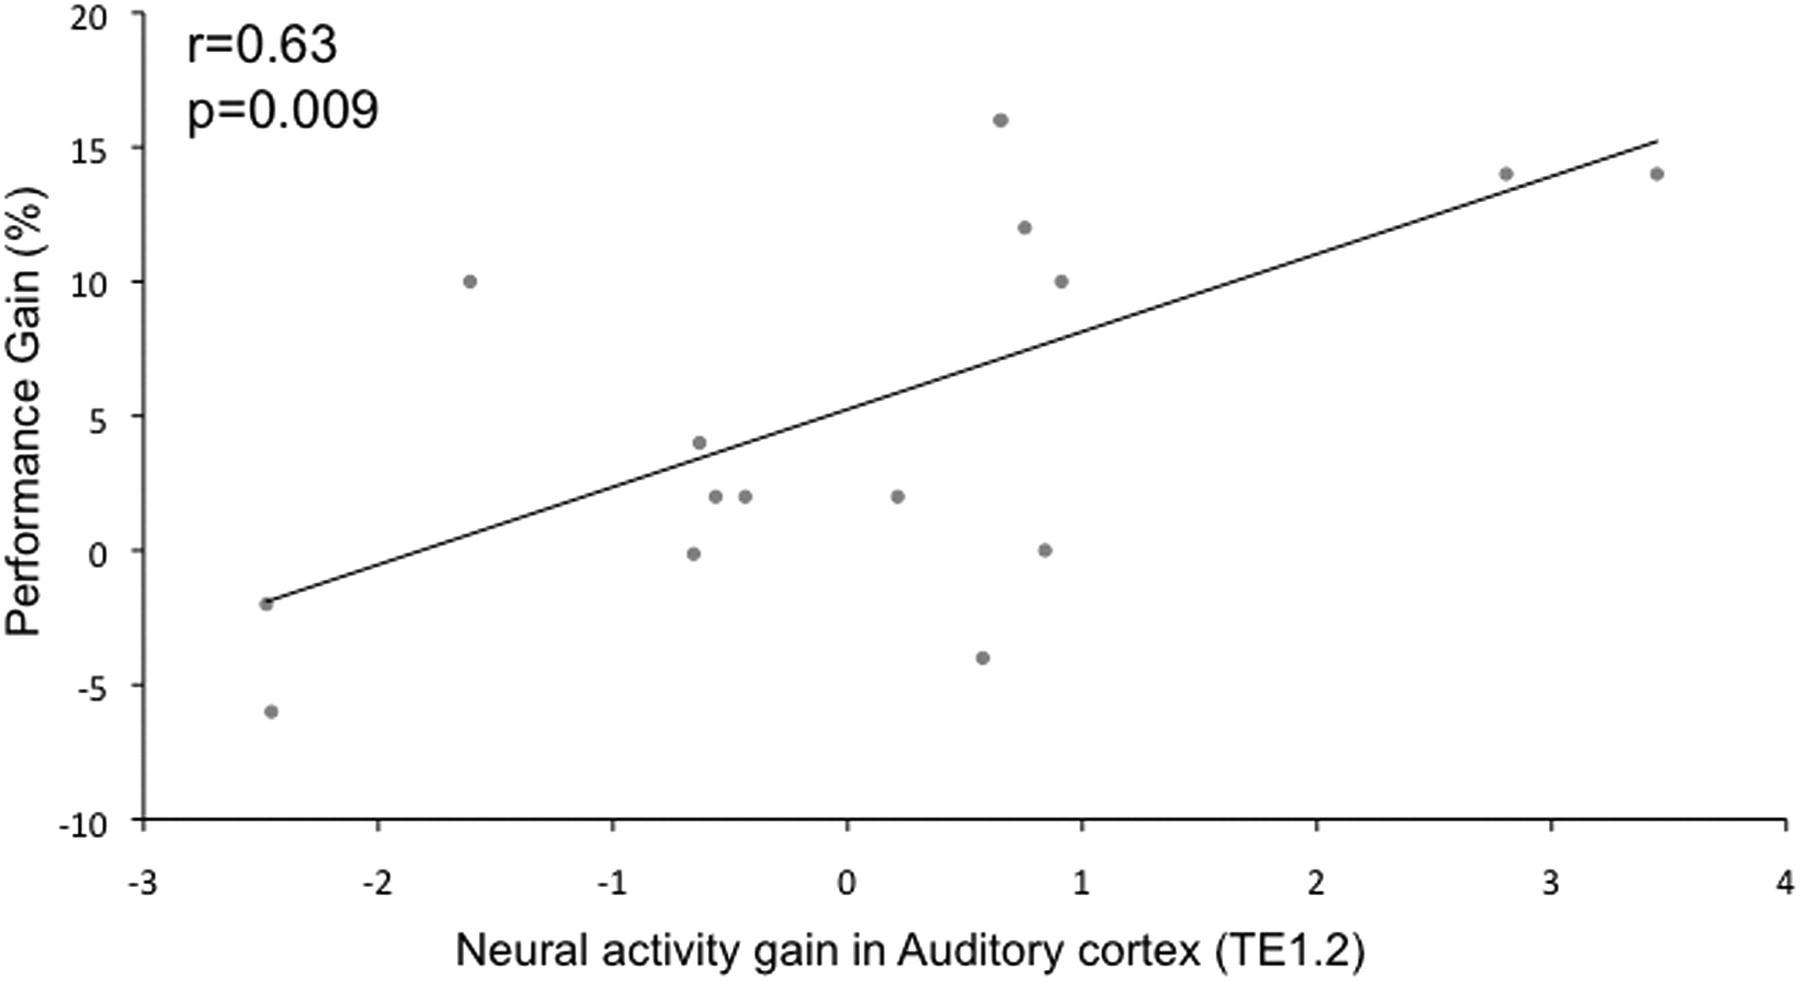 Brainspeech Alignment Enhances Auditory Cortical Responses And Block Diagram Of Speech Recognition Procedures Download Figure